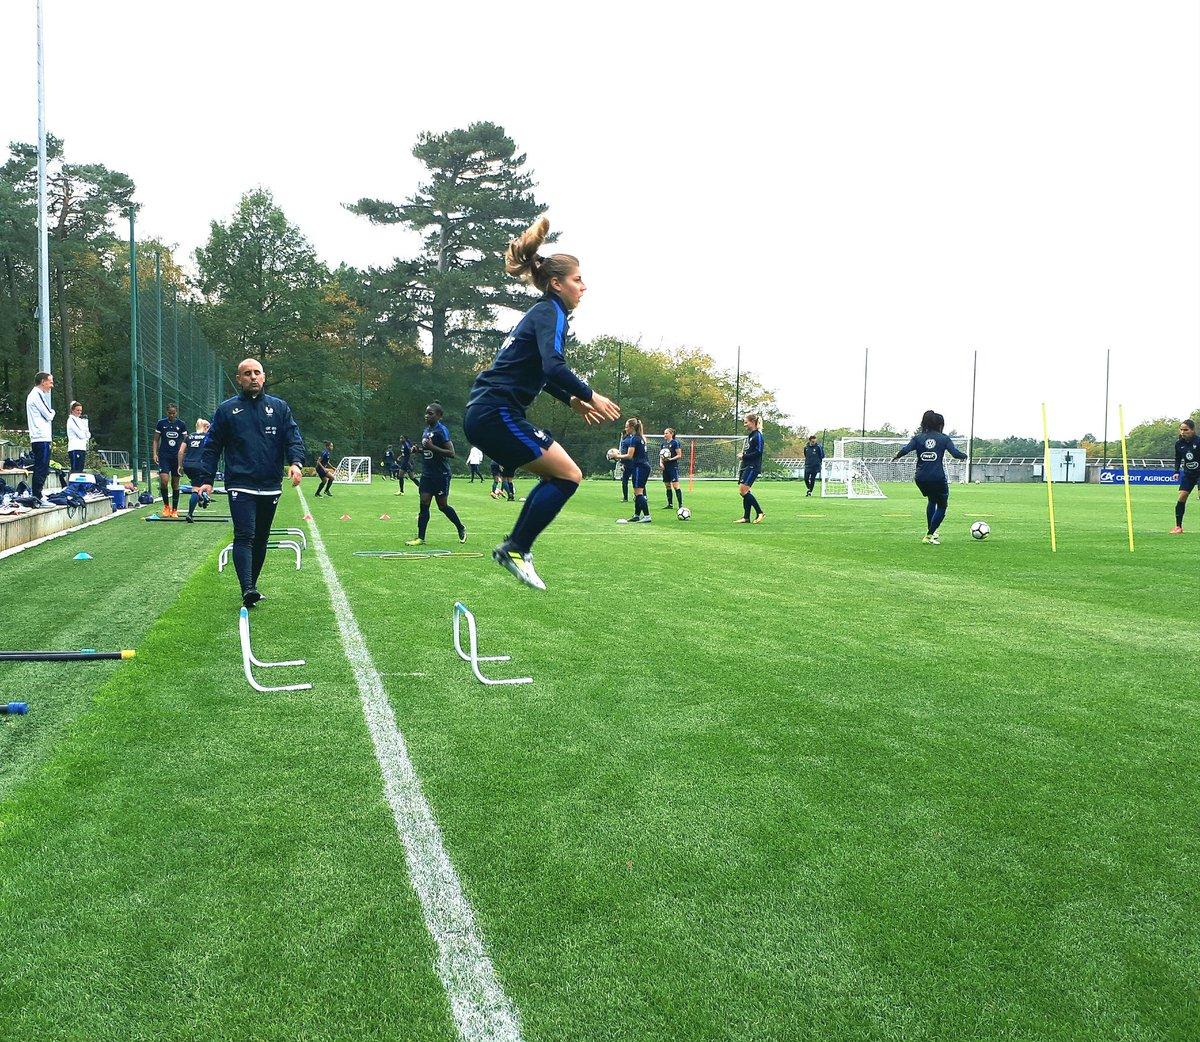 Équipe de France féminine de football DMbHoUpX0AAHWYR